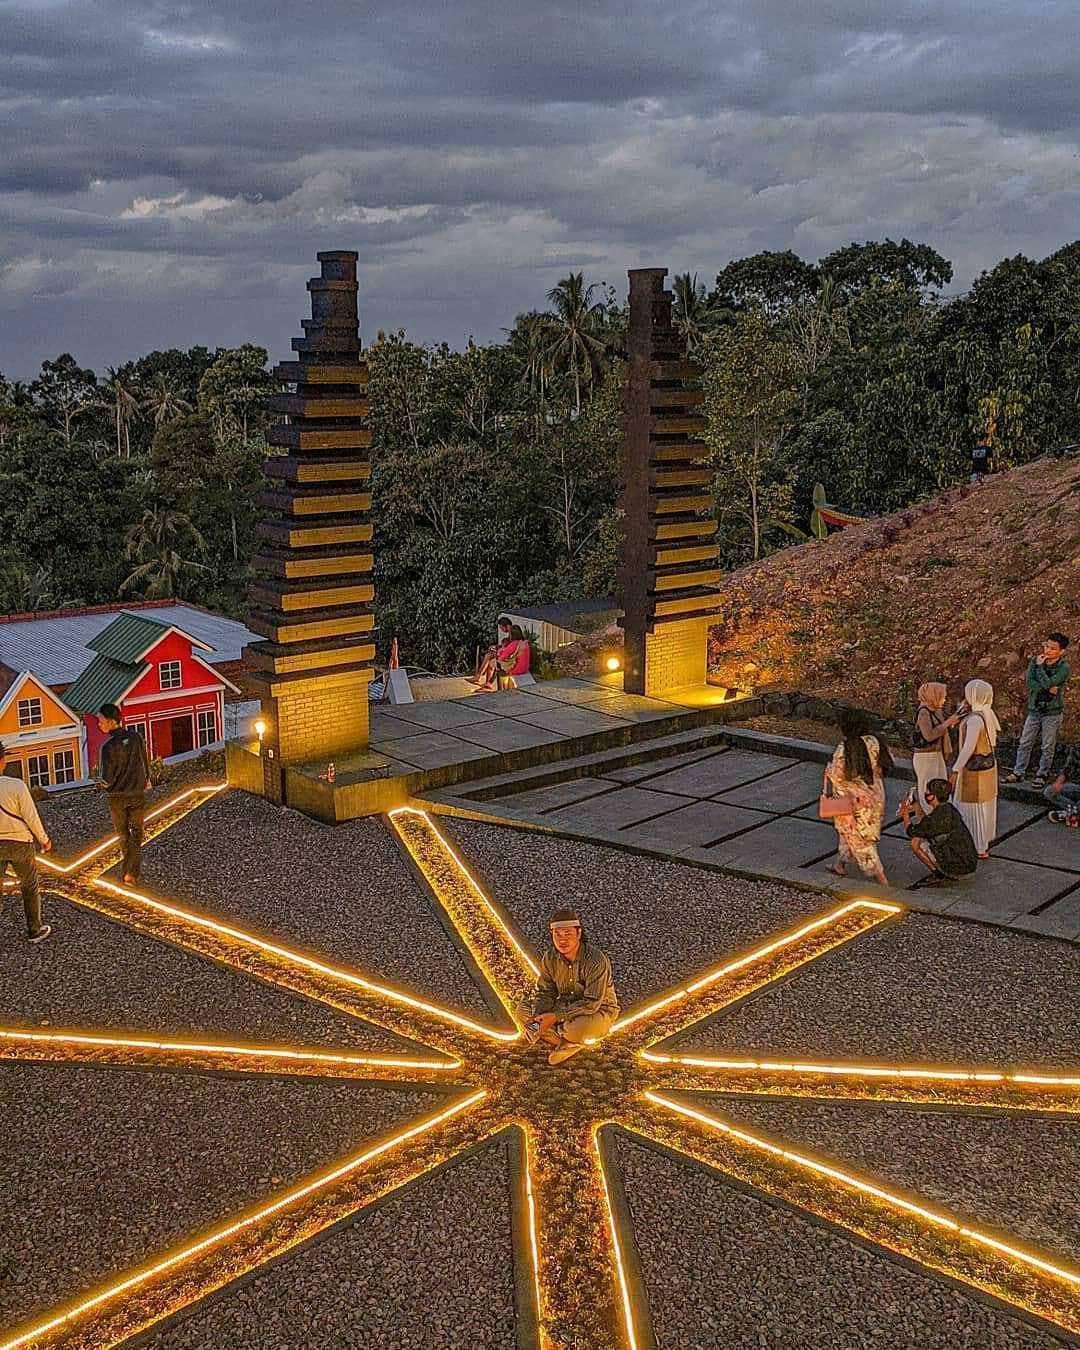 Lampu-Lampu LED di Lengkung Langit Lampung, Image From @fajarvadawi